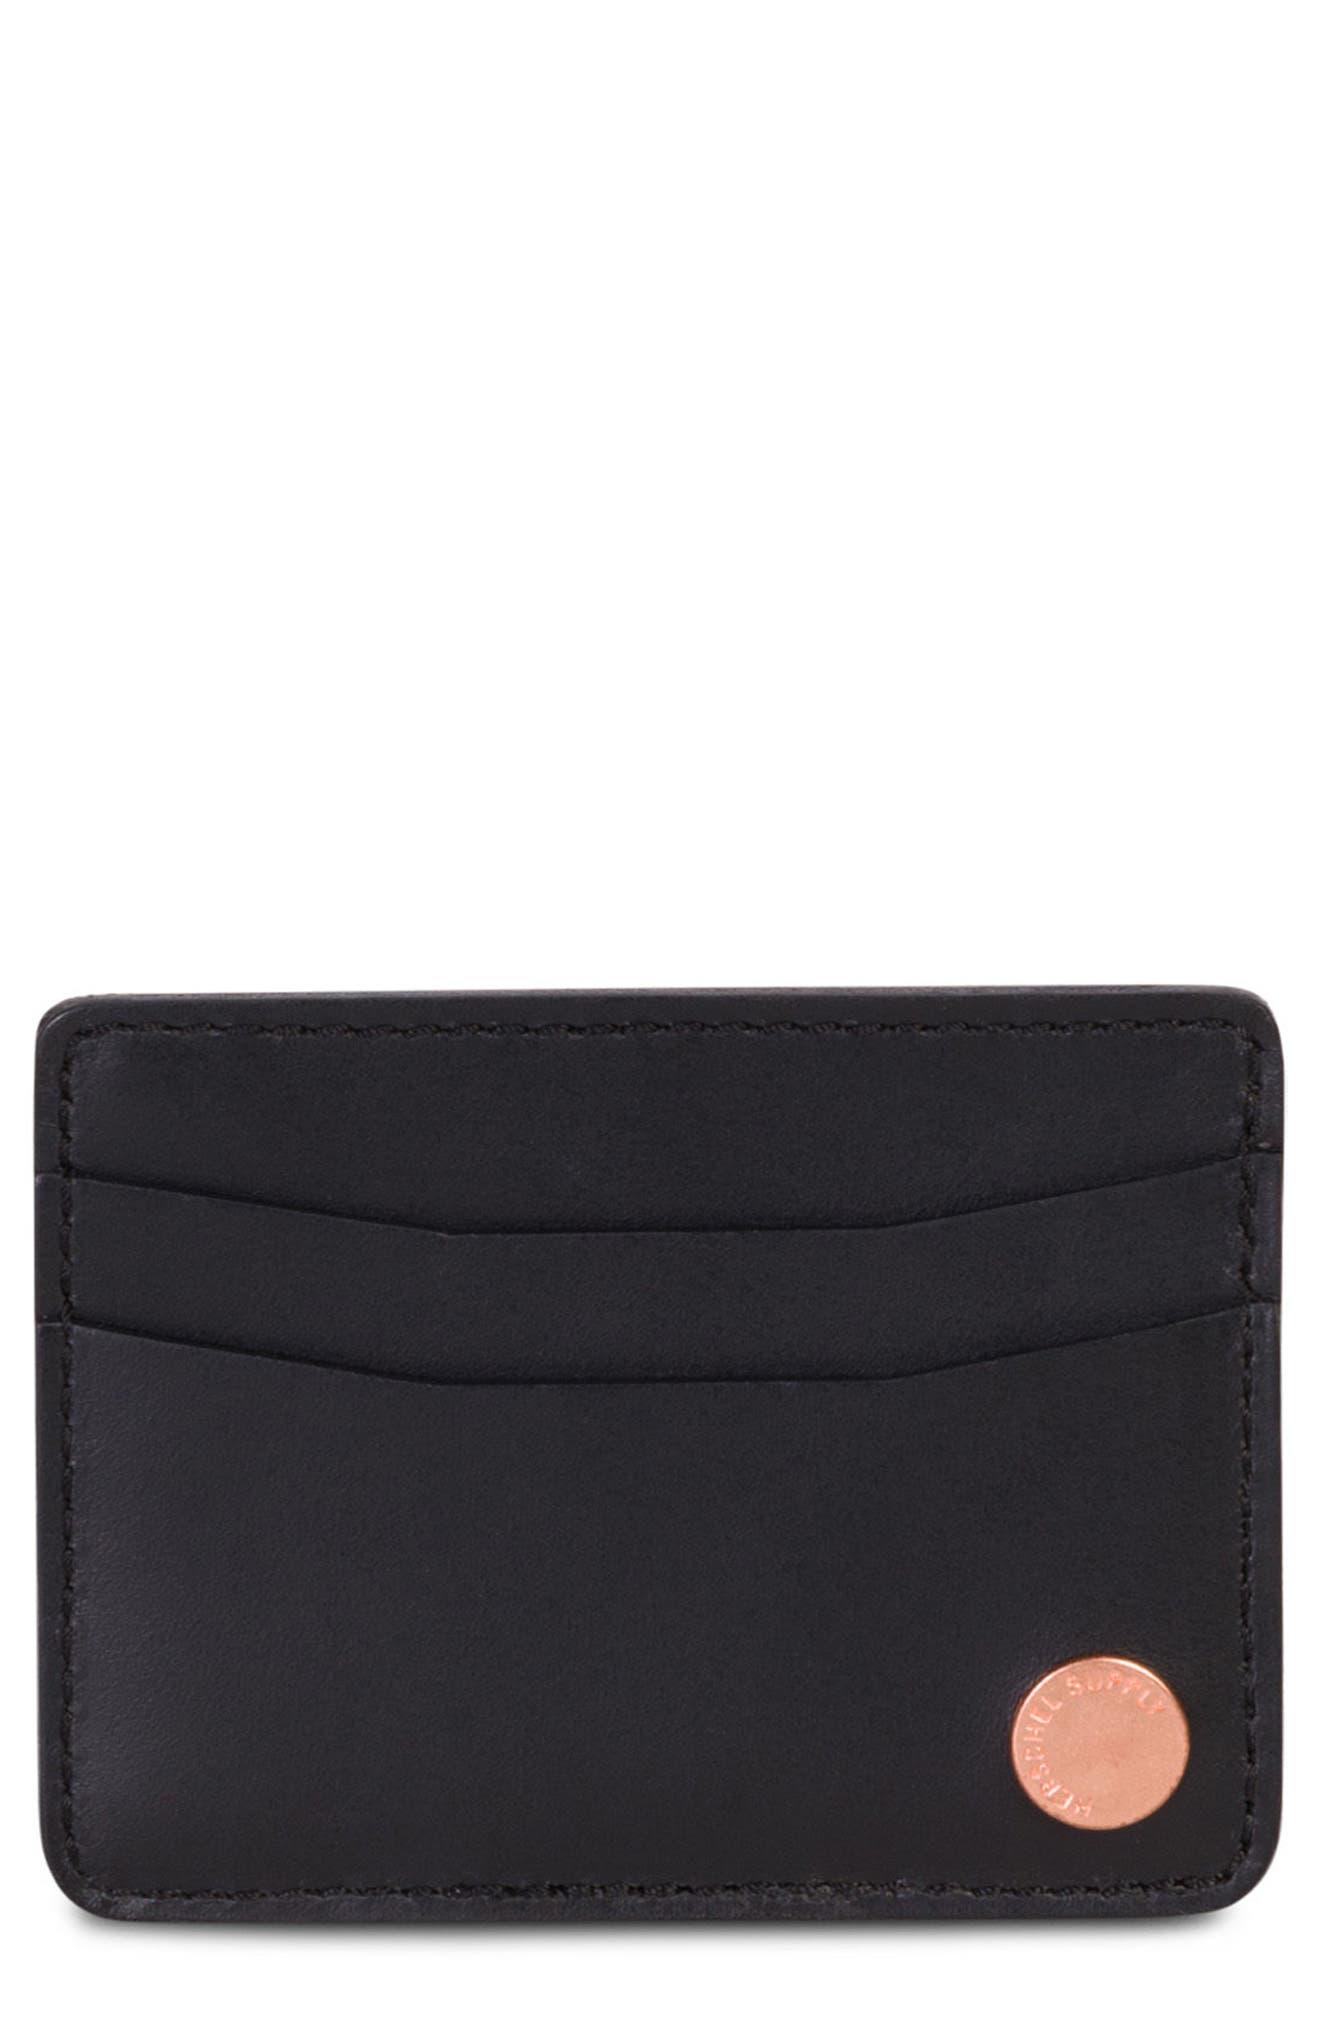 Ace Leather Card Case,                         Main,                         color, 001